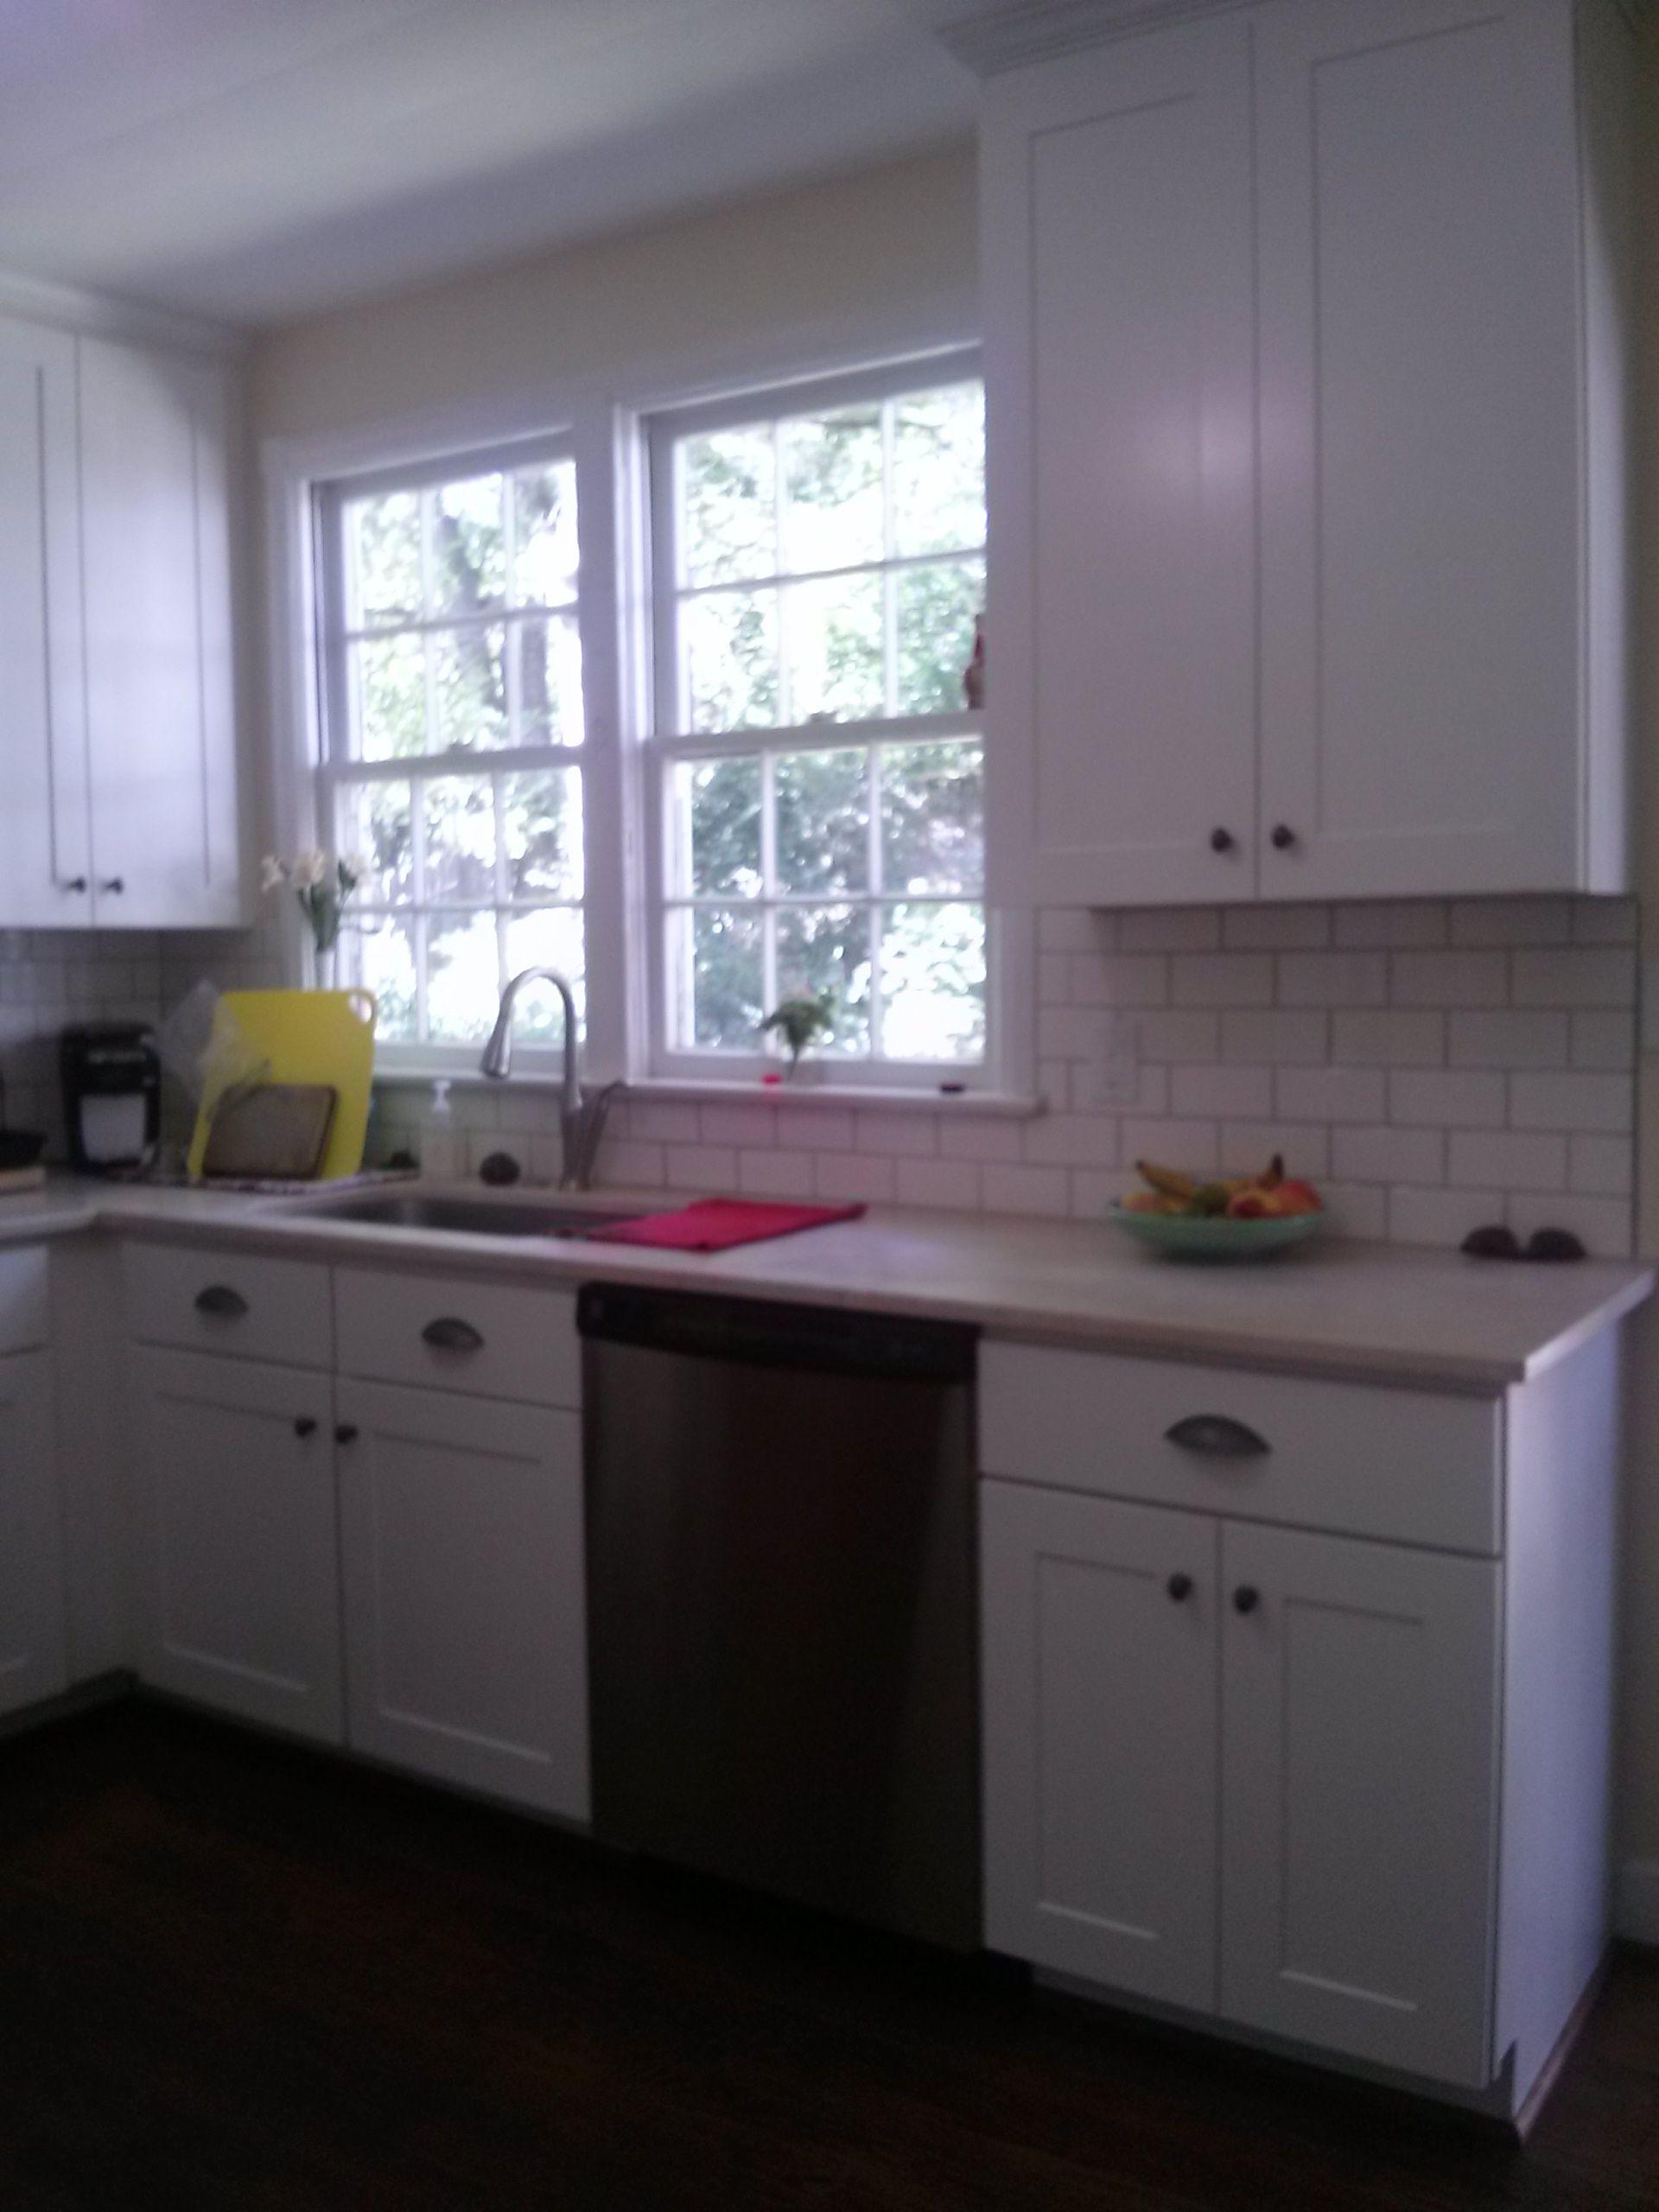 kitchen remodel avondale (birmingham) alabama | kitchens designed by